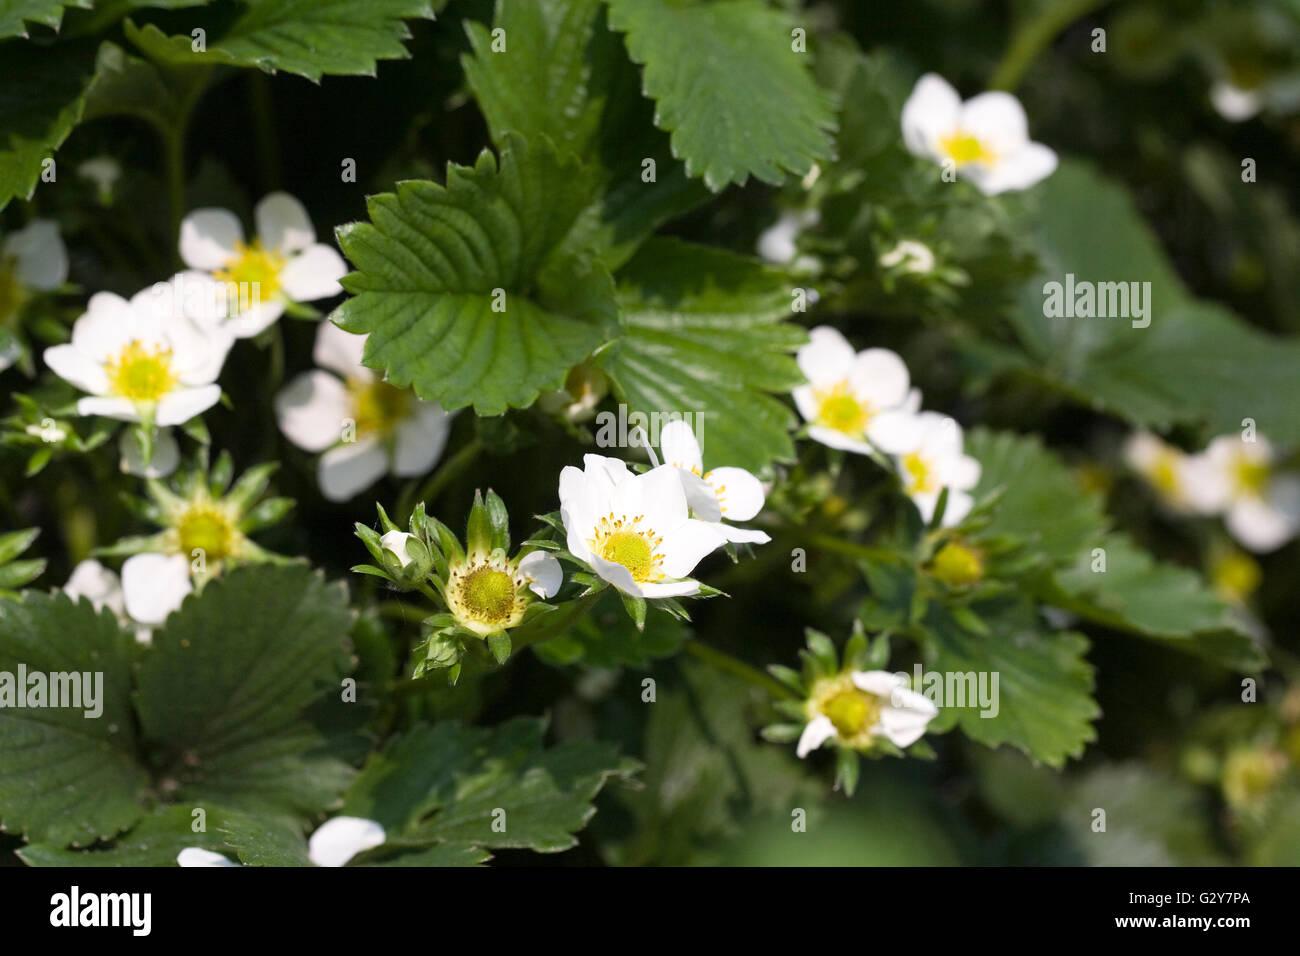 Fragaria × ananassa. Strawberry 'Alice' flowers. Stock Photo